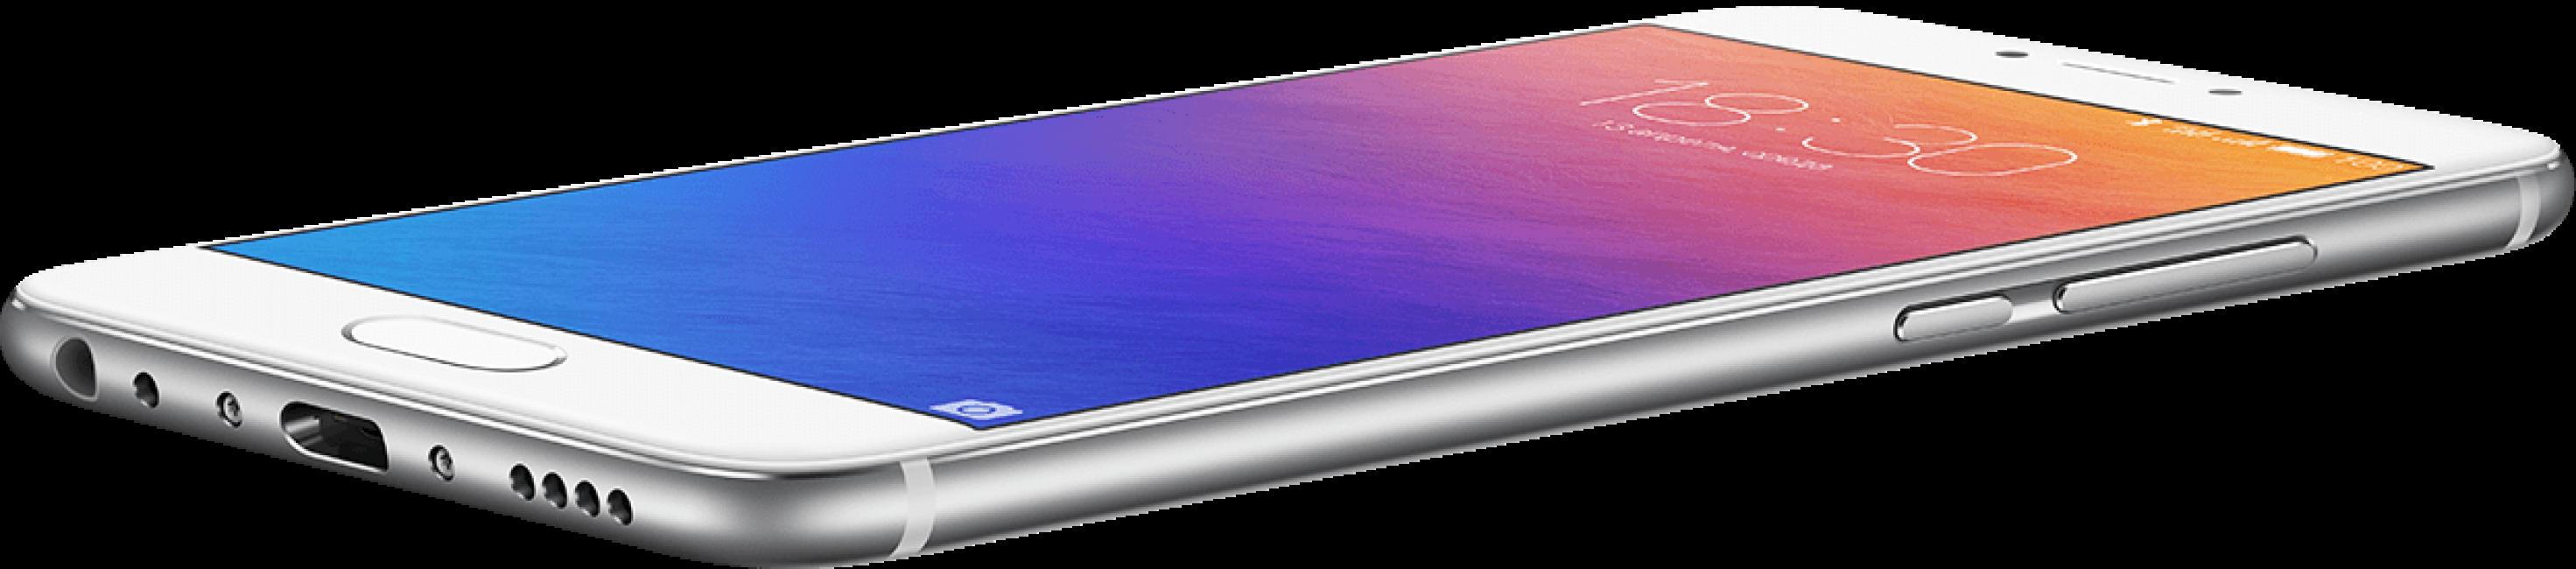 Smartphone Meizu Pro 6